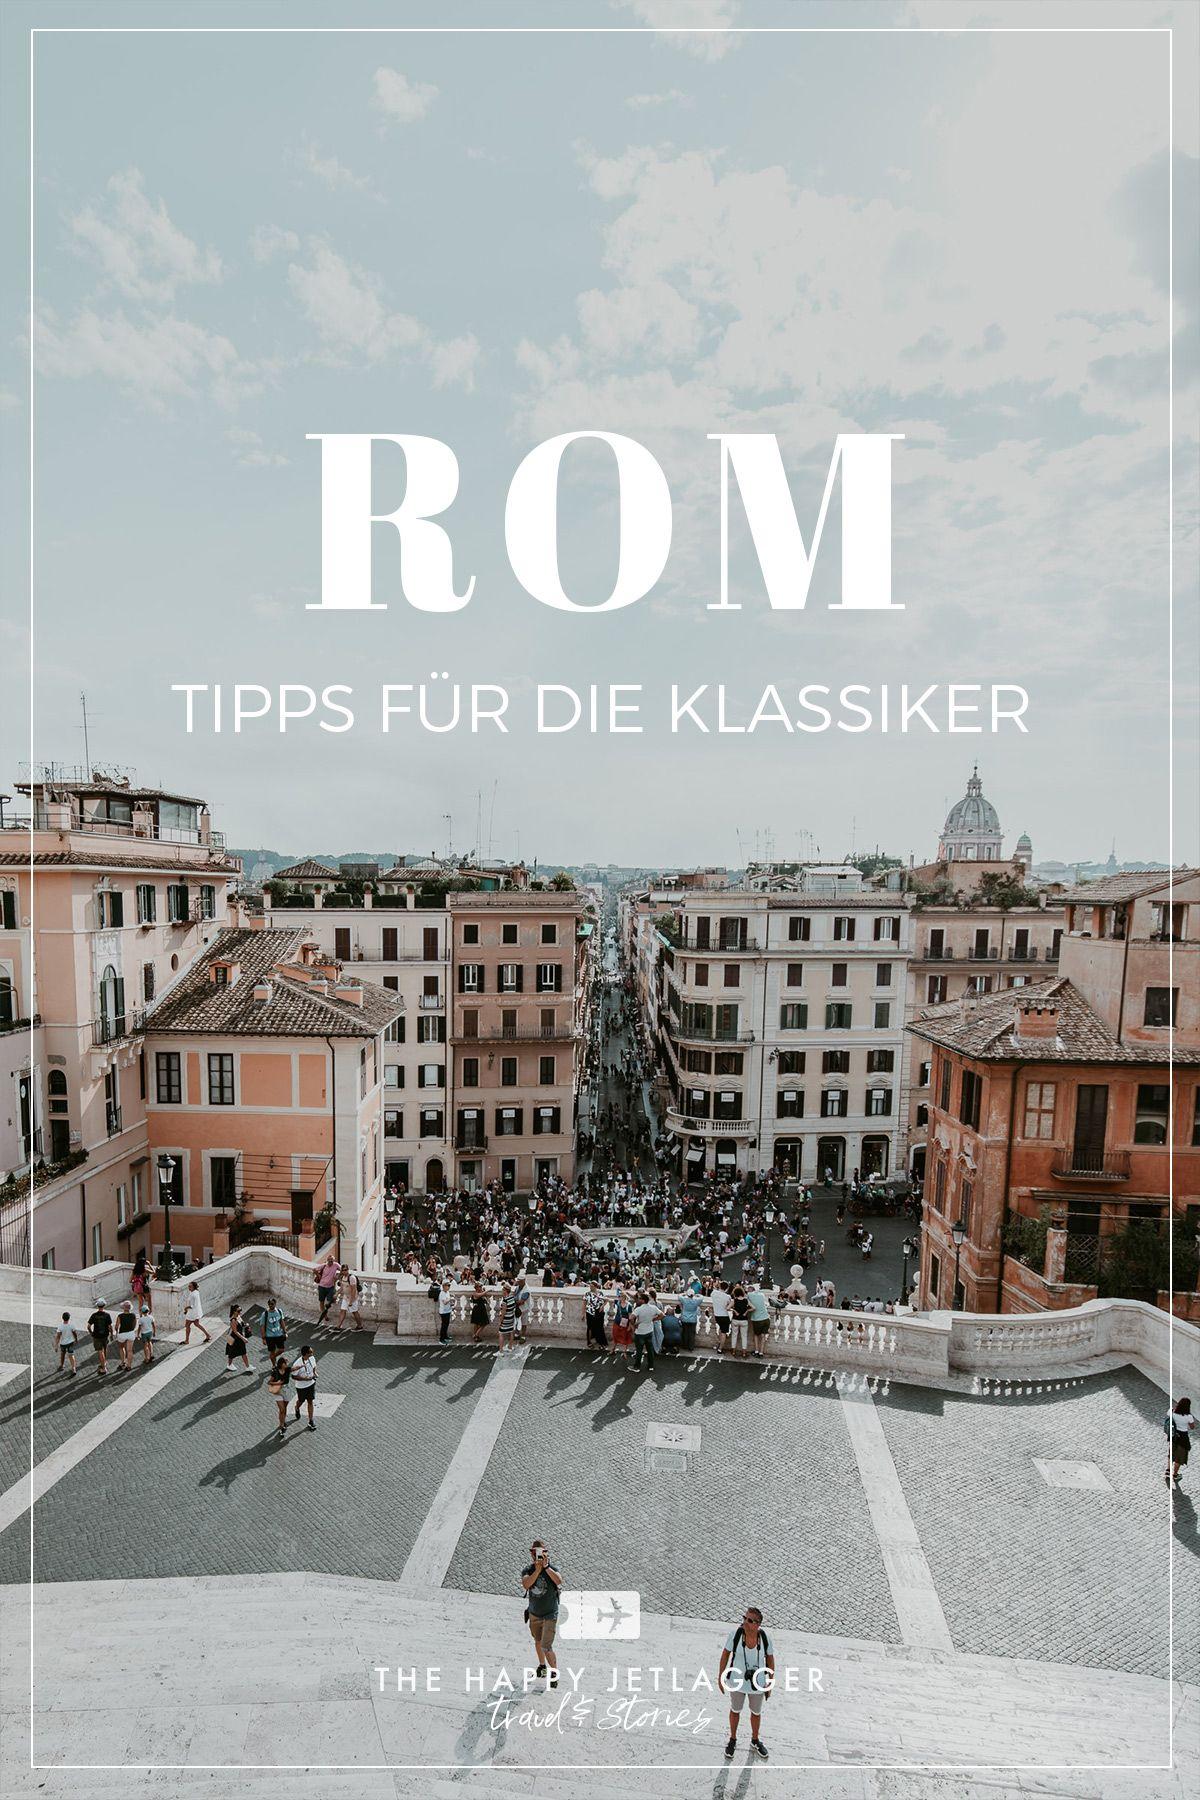 Rom 5 Klassiker In Der Ewigen Stadt Italien Reisen Rom Rom Tipps